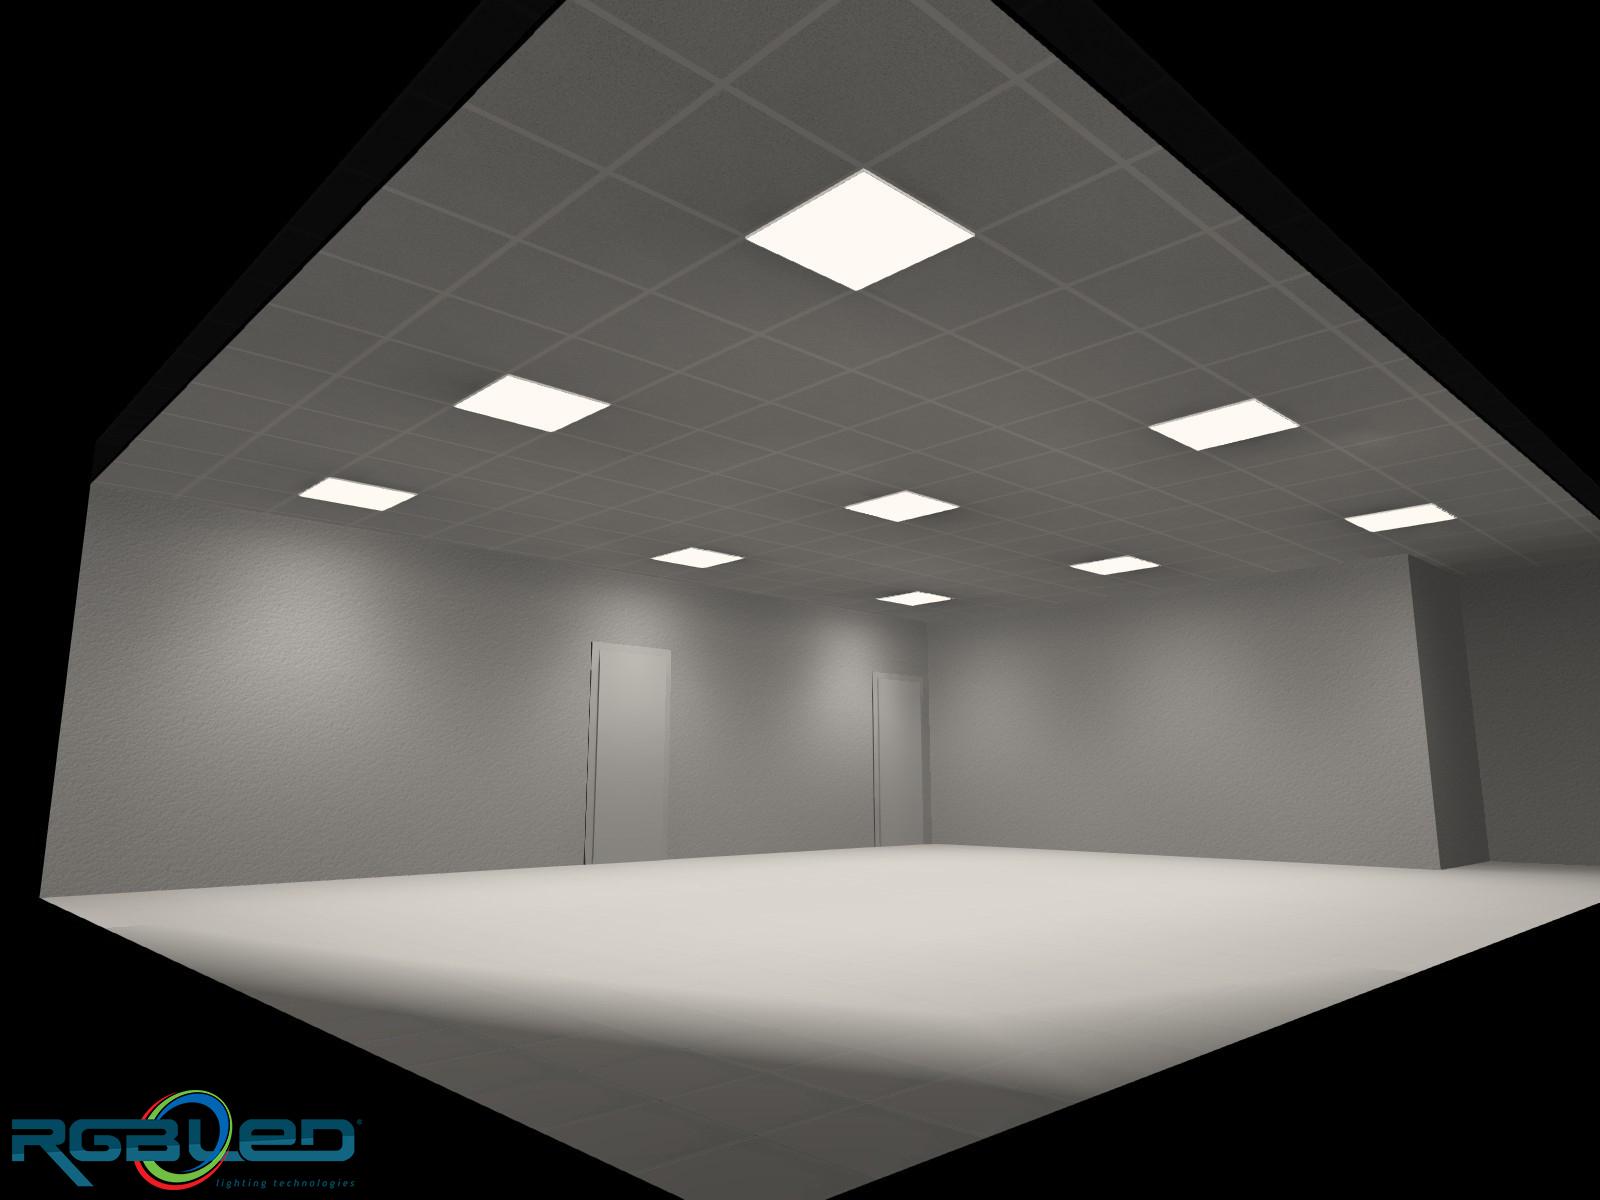 WDP Verdifarm – Bureau – Verdieping 1 – Grote vergaderzaal – 02